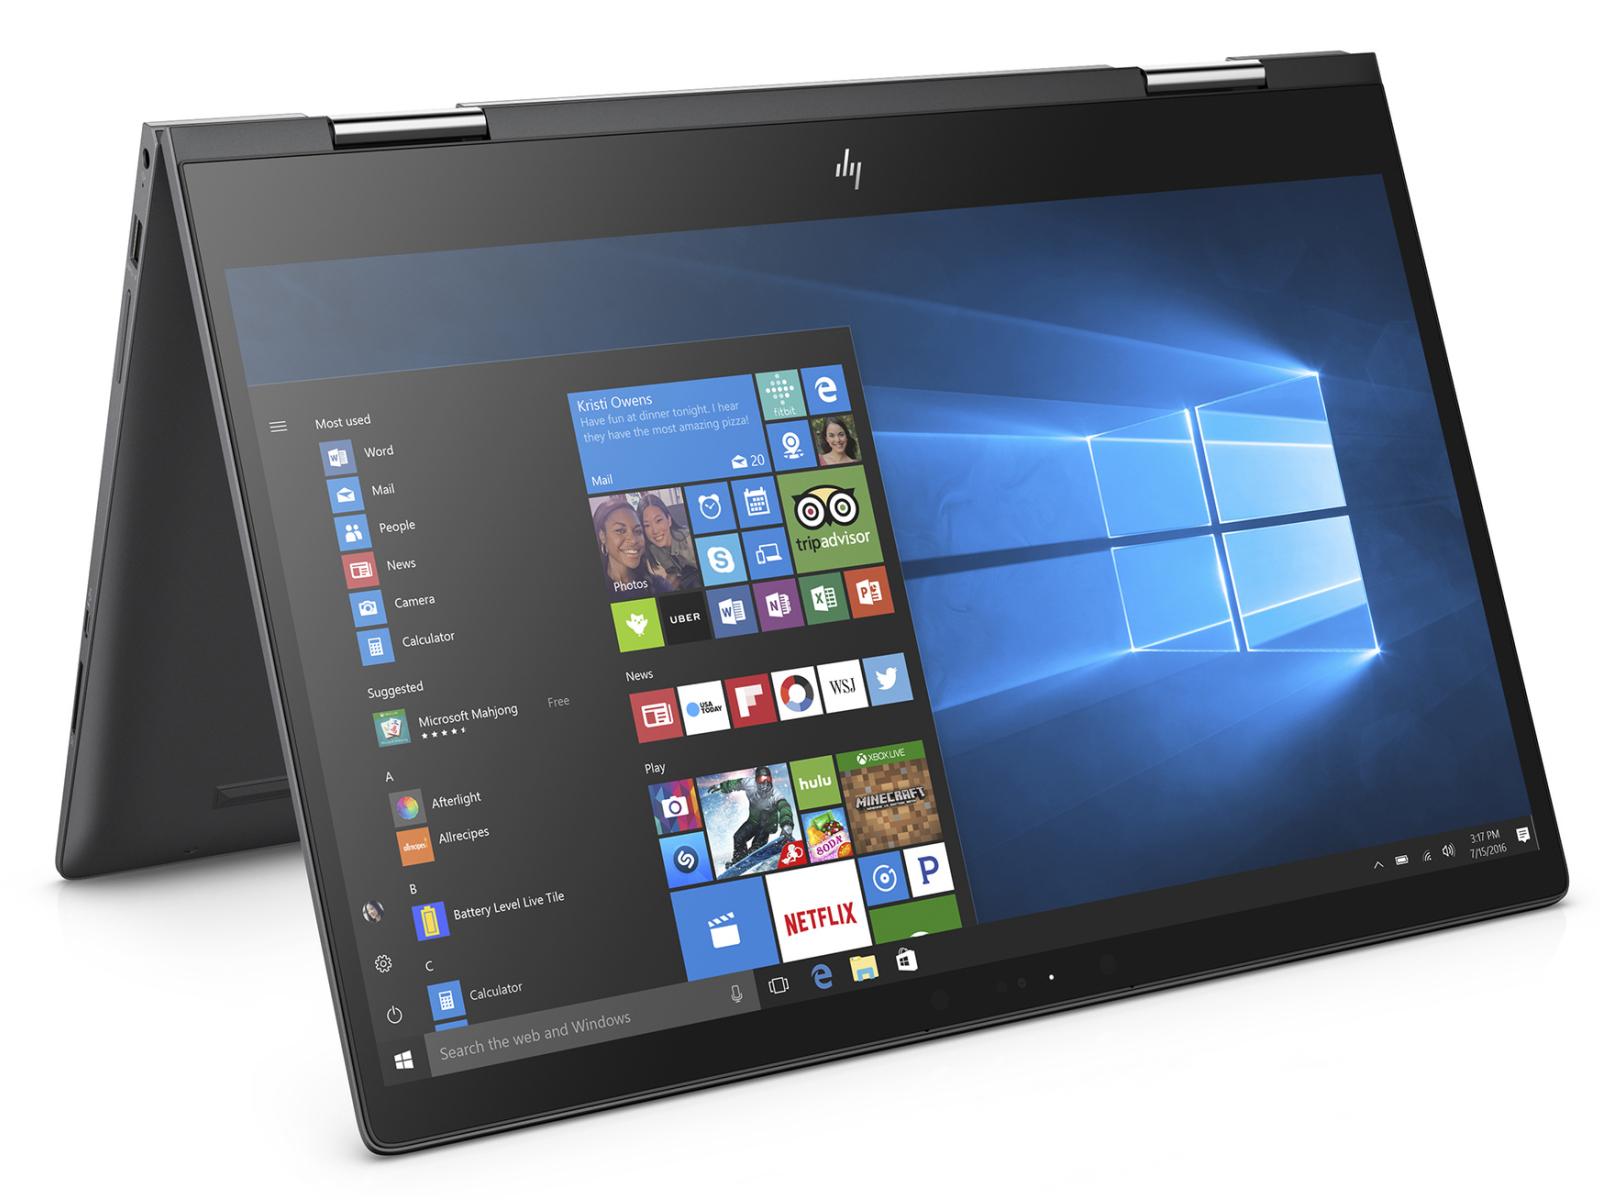 HP Envy x360 15z (Ryzen 5 2500U, Vega 8, SSD, FHD) Convertible